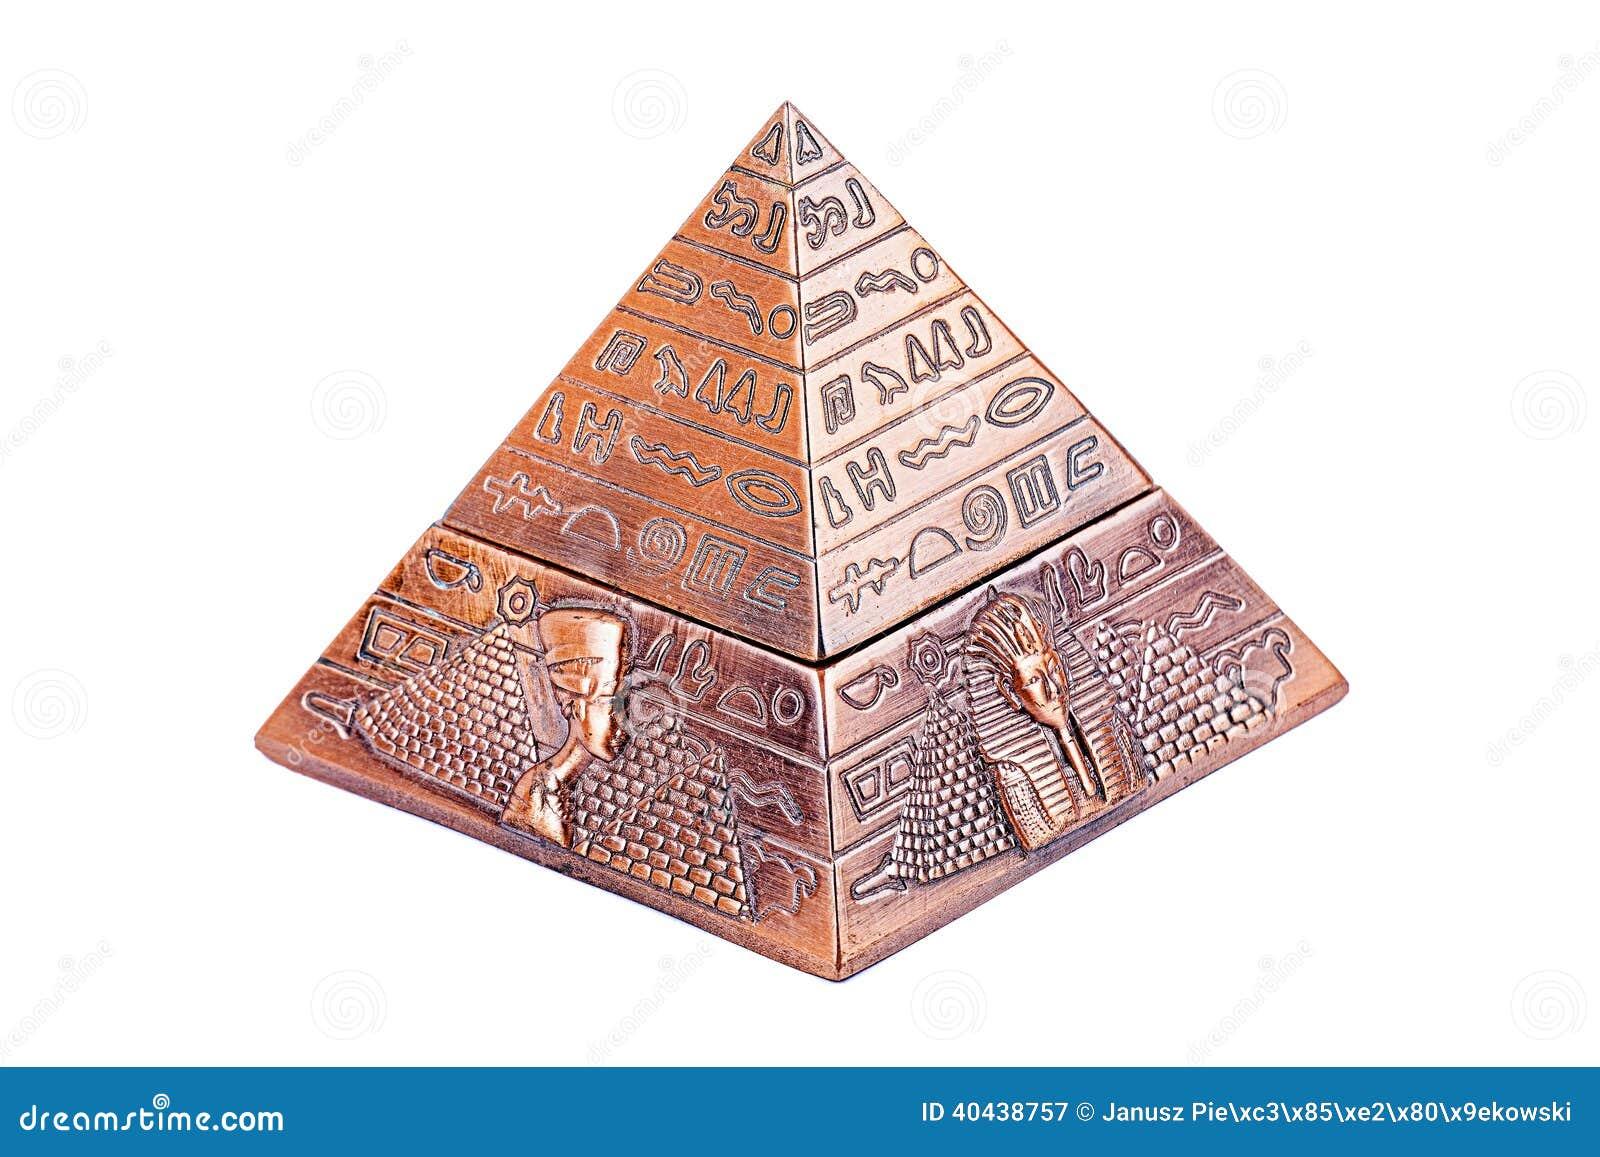 epub Trace elements in man